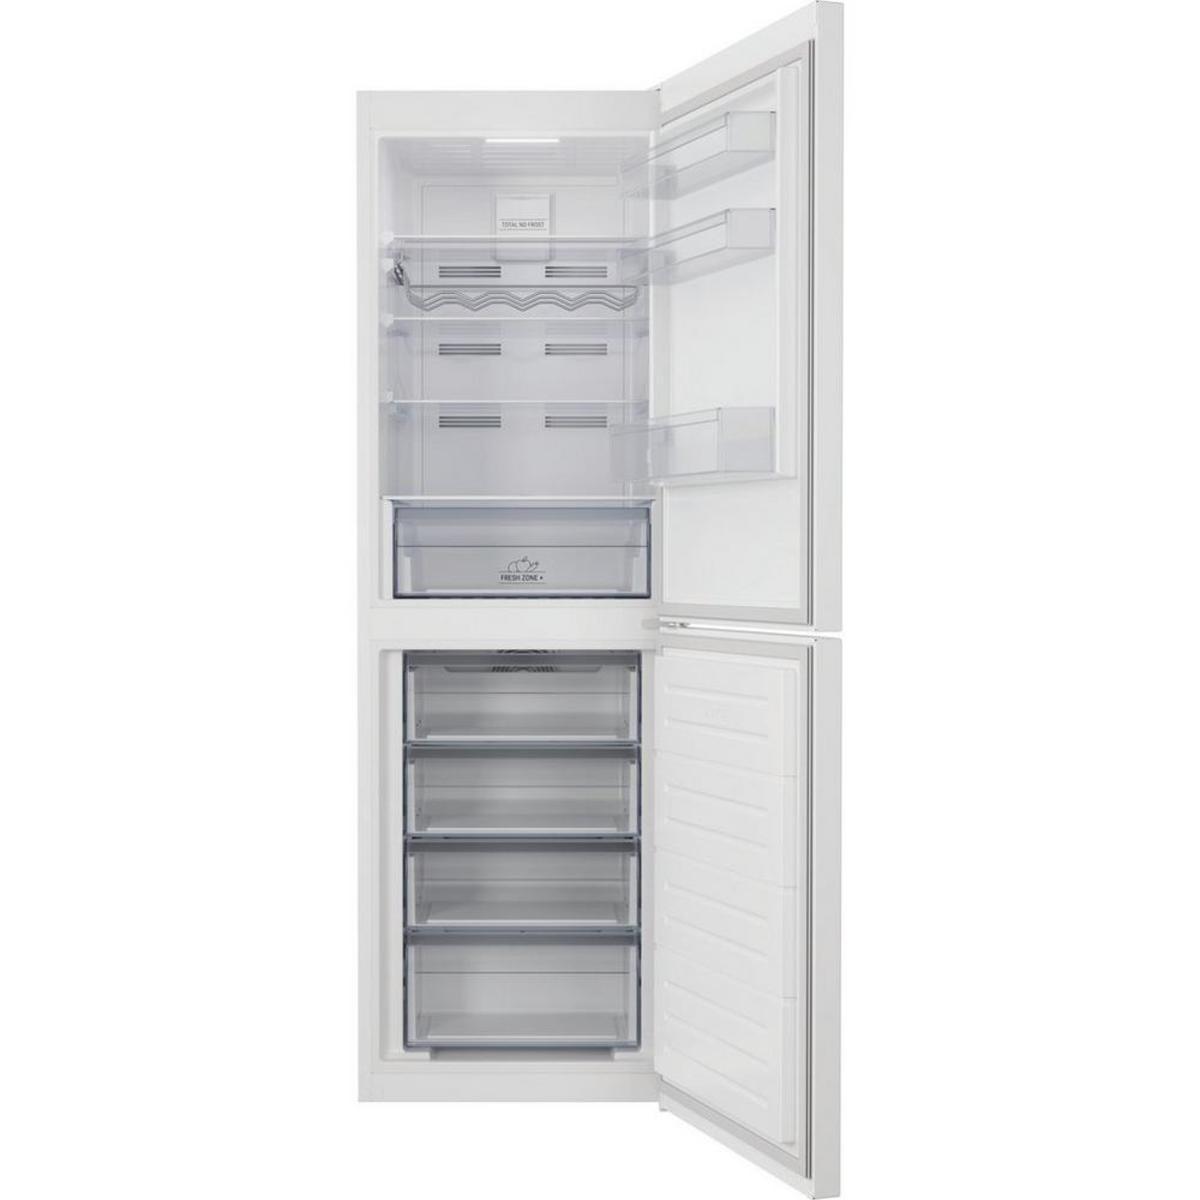 HOTPOINT HCIH50TI1WUK 60cm Frost Free Fridge Freezer, White